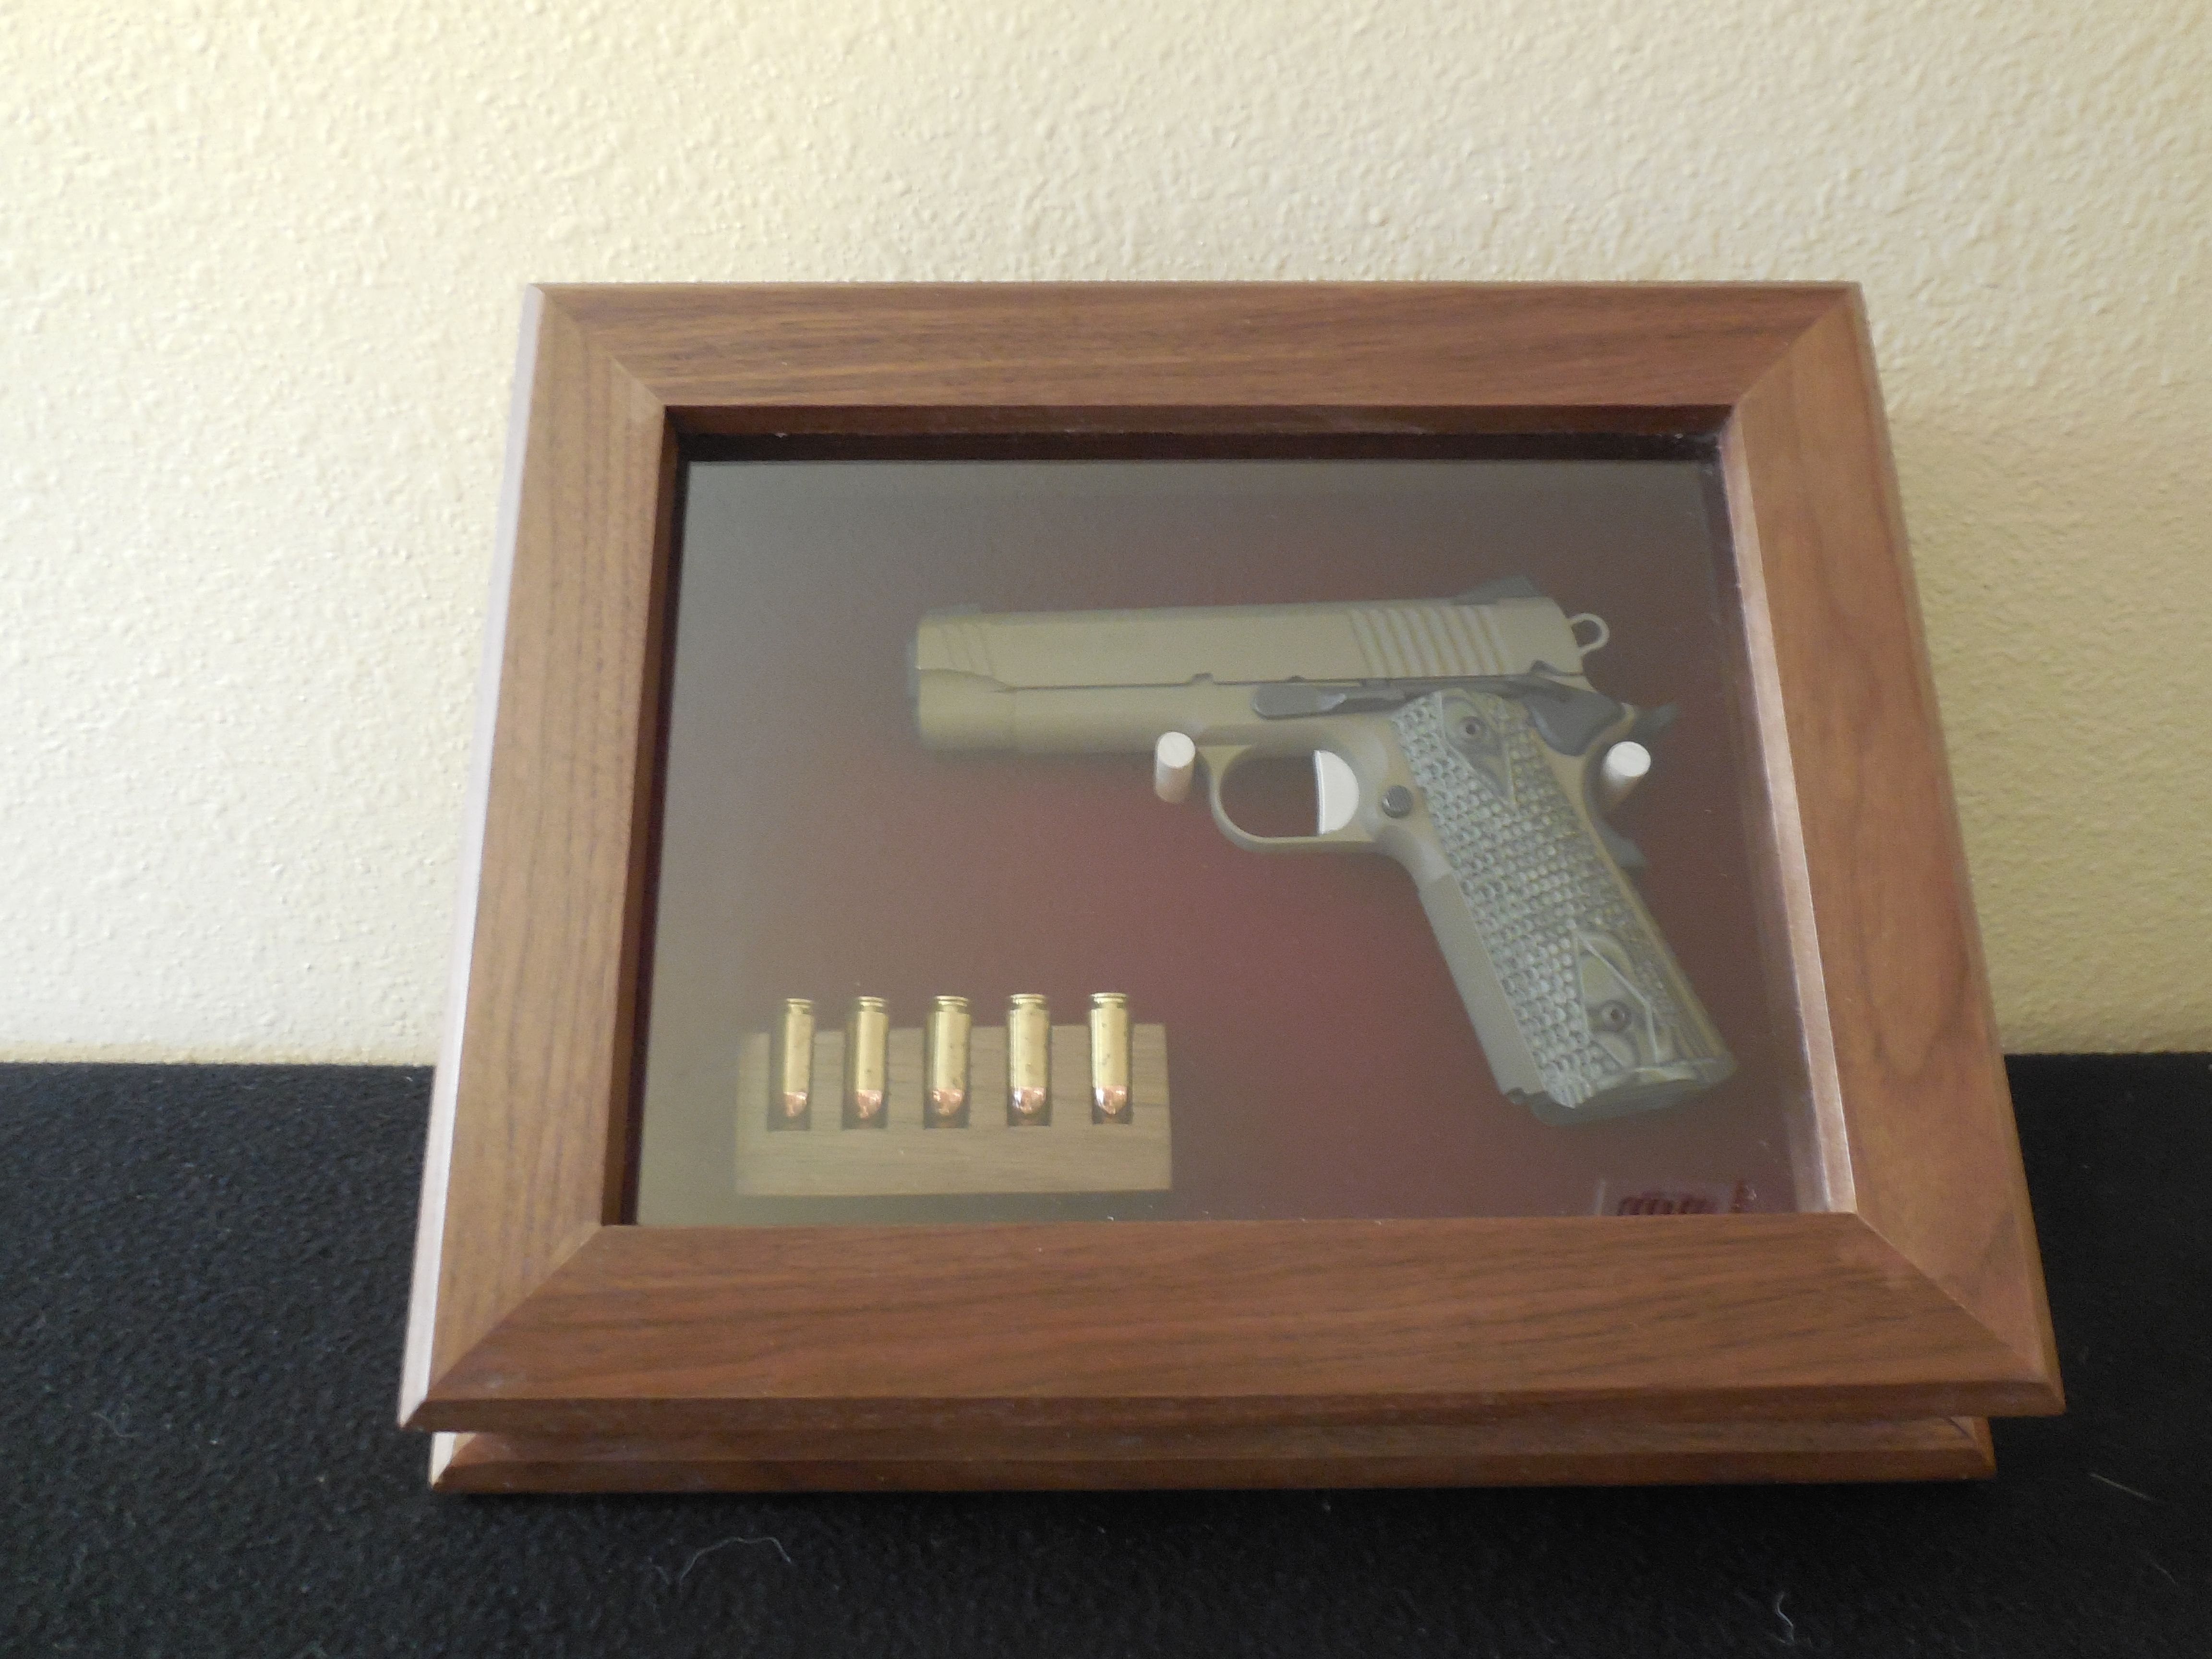 Creative Custom Made Pistol Display Case Handmade Pistol Display Case By Longhorn Woodworks Supply Commercial Gun Display Cases Custom Gun Display Case houzz-03 Gun Display Case